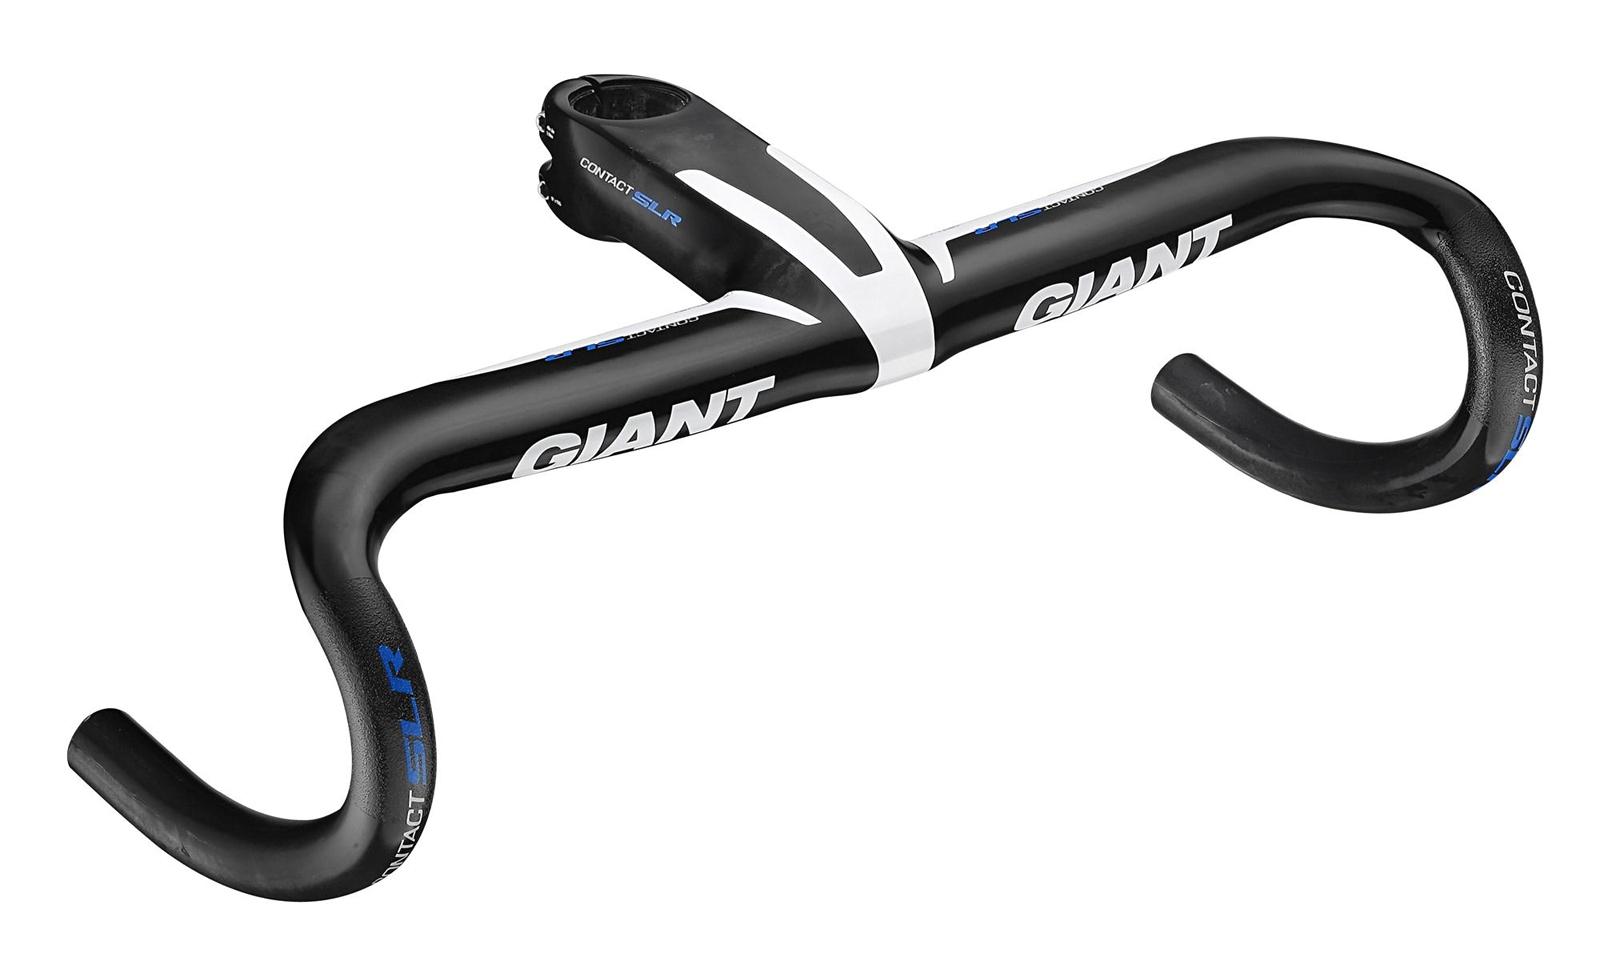 Giant Contact Slr Aero Integrated Handlebar Wheel World Bike Shops